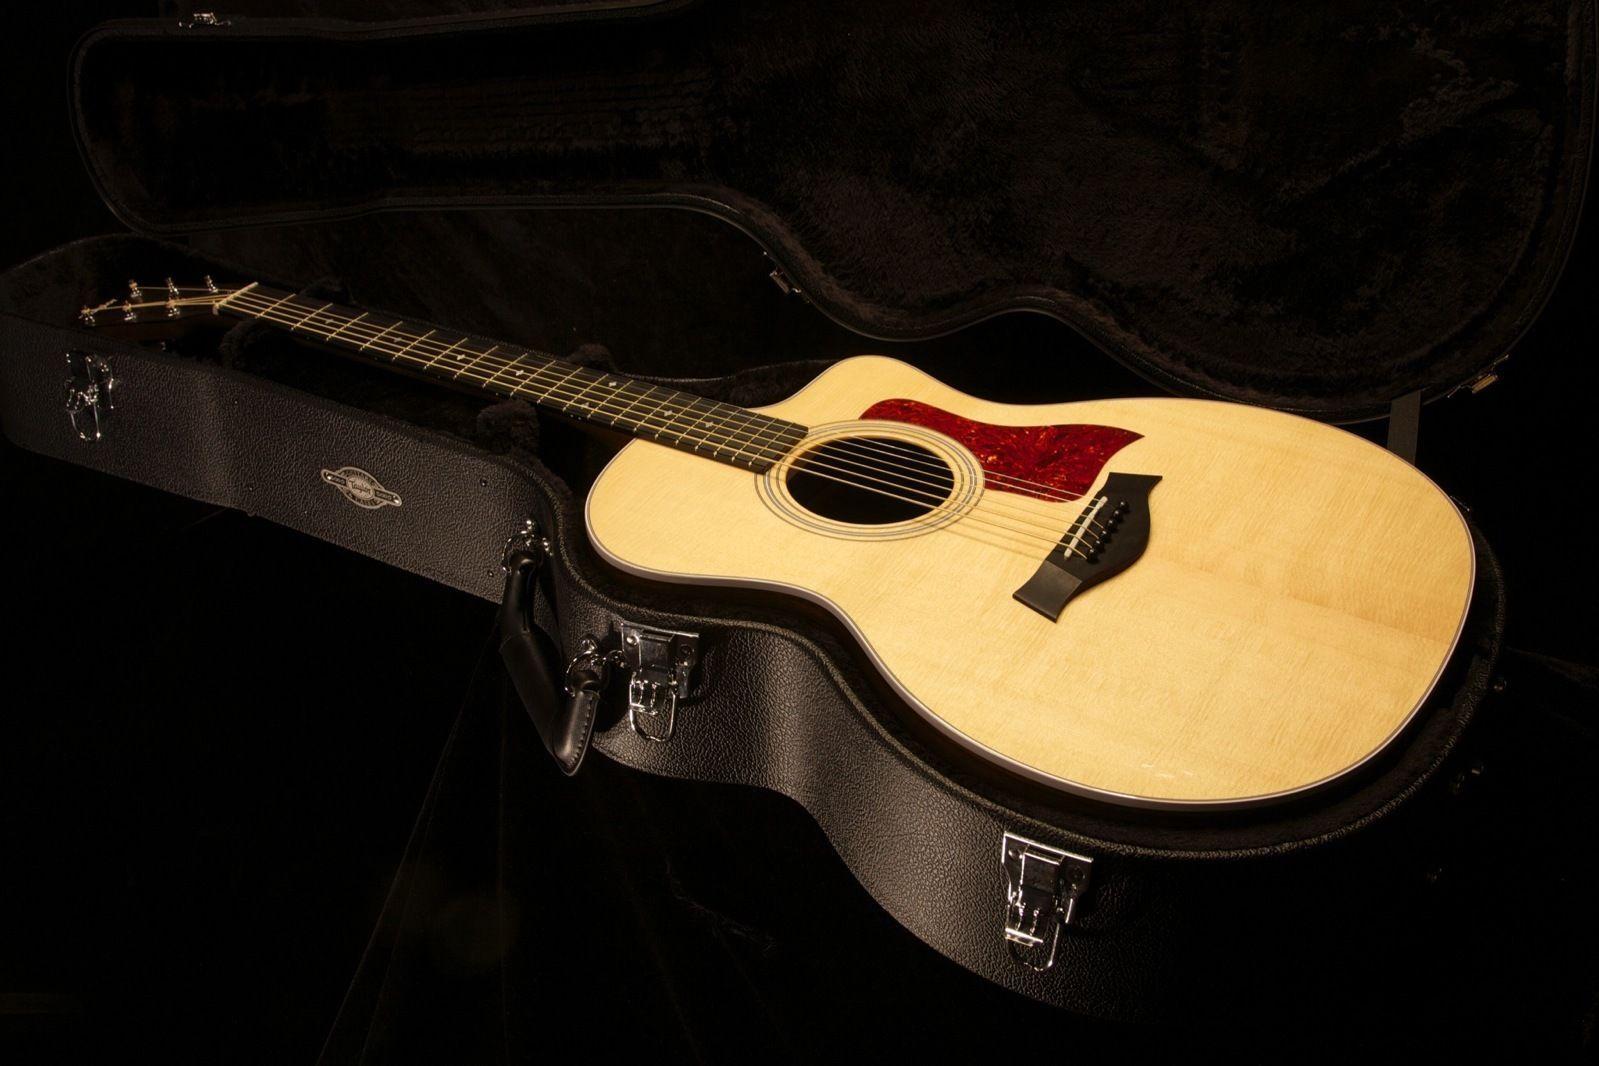 Taylor Guitar Buying Guide